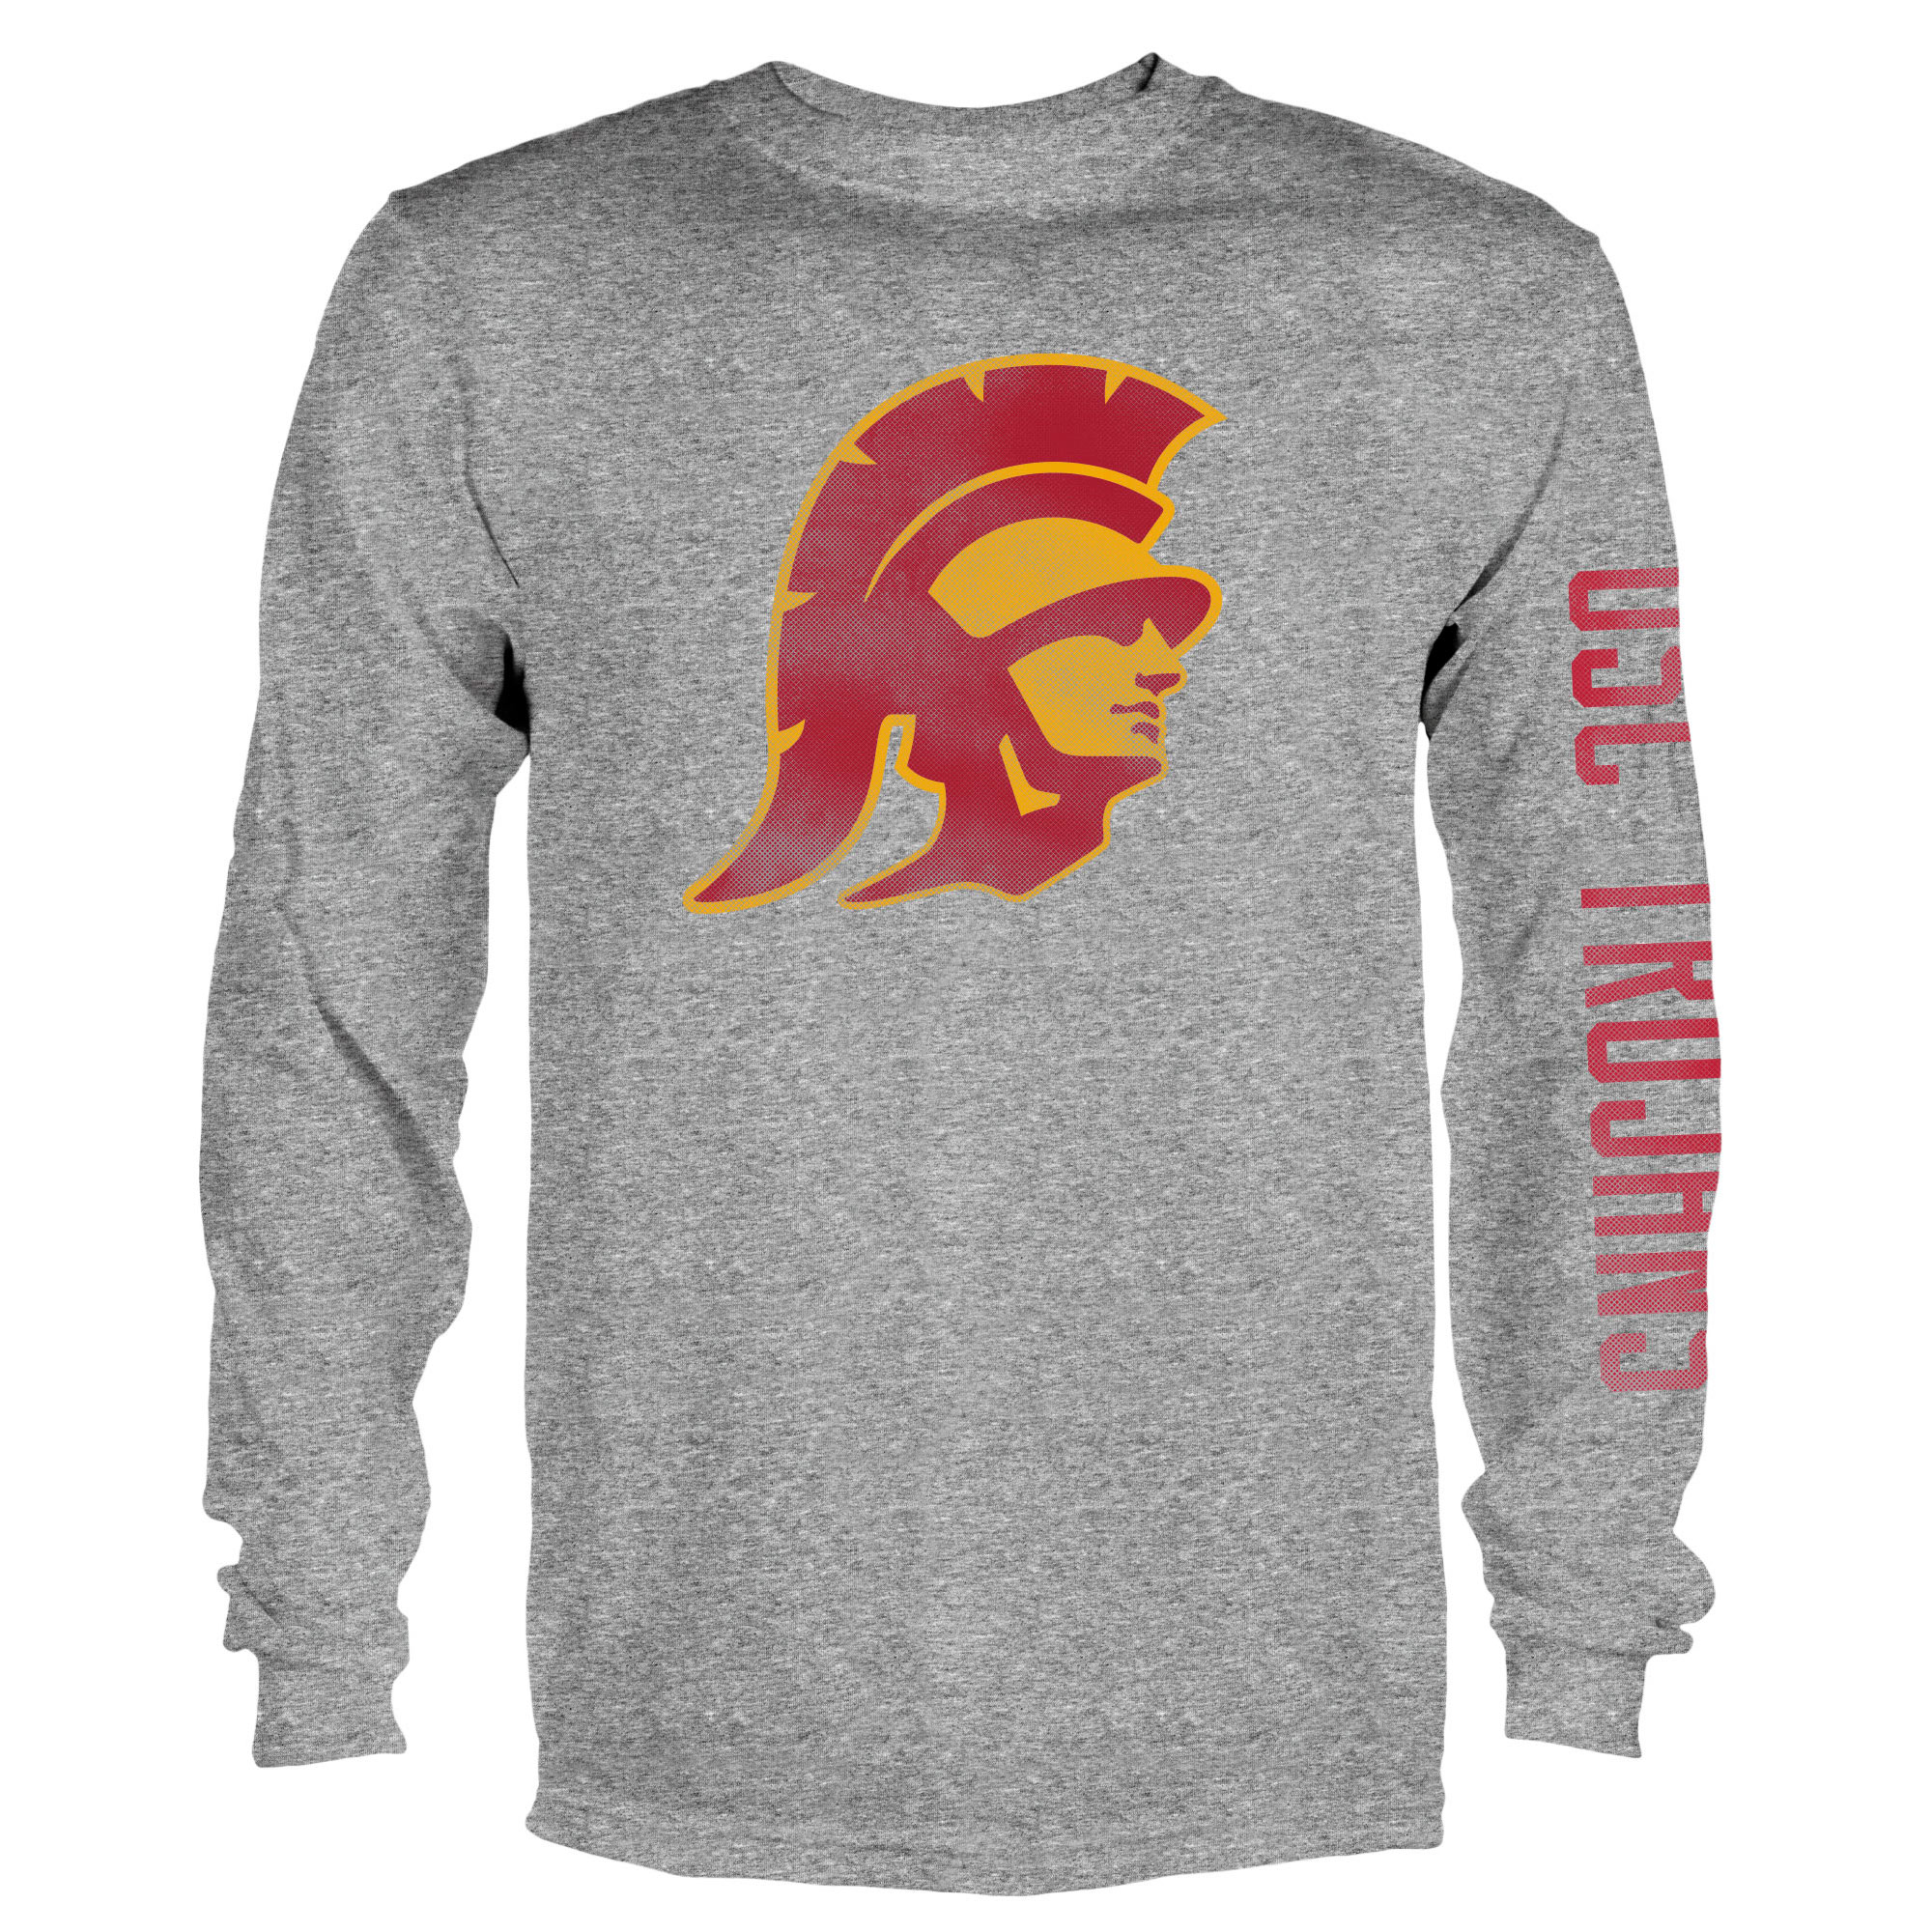 Men's Gray USC Trojans Notion Long Sleeve T-Shirt